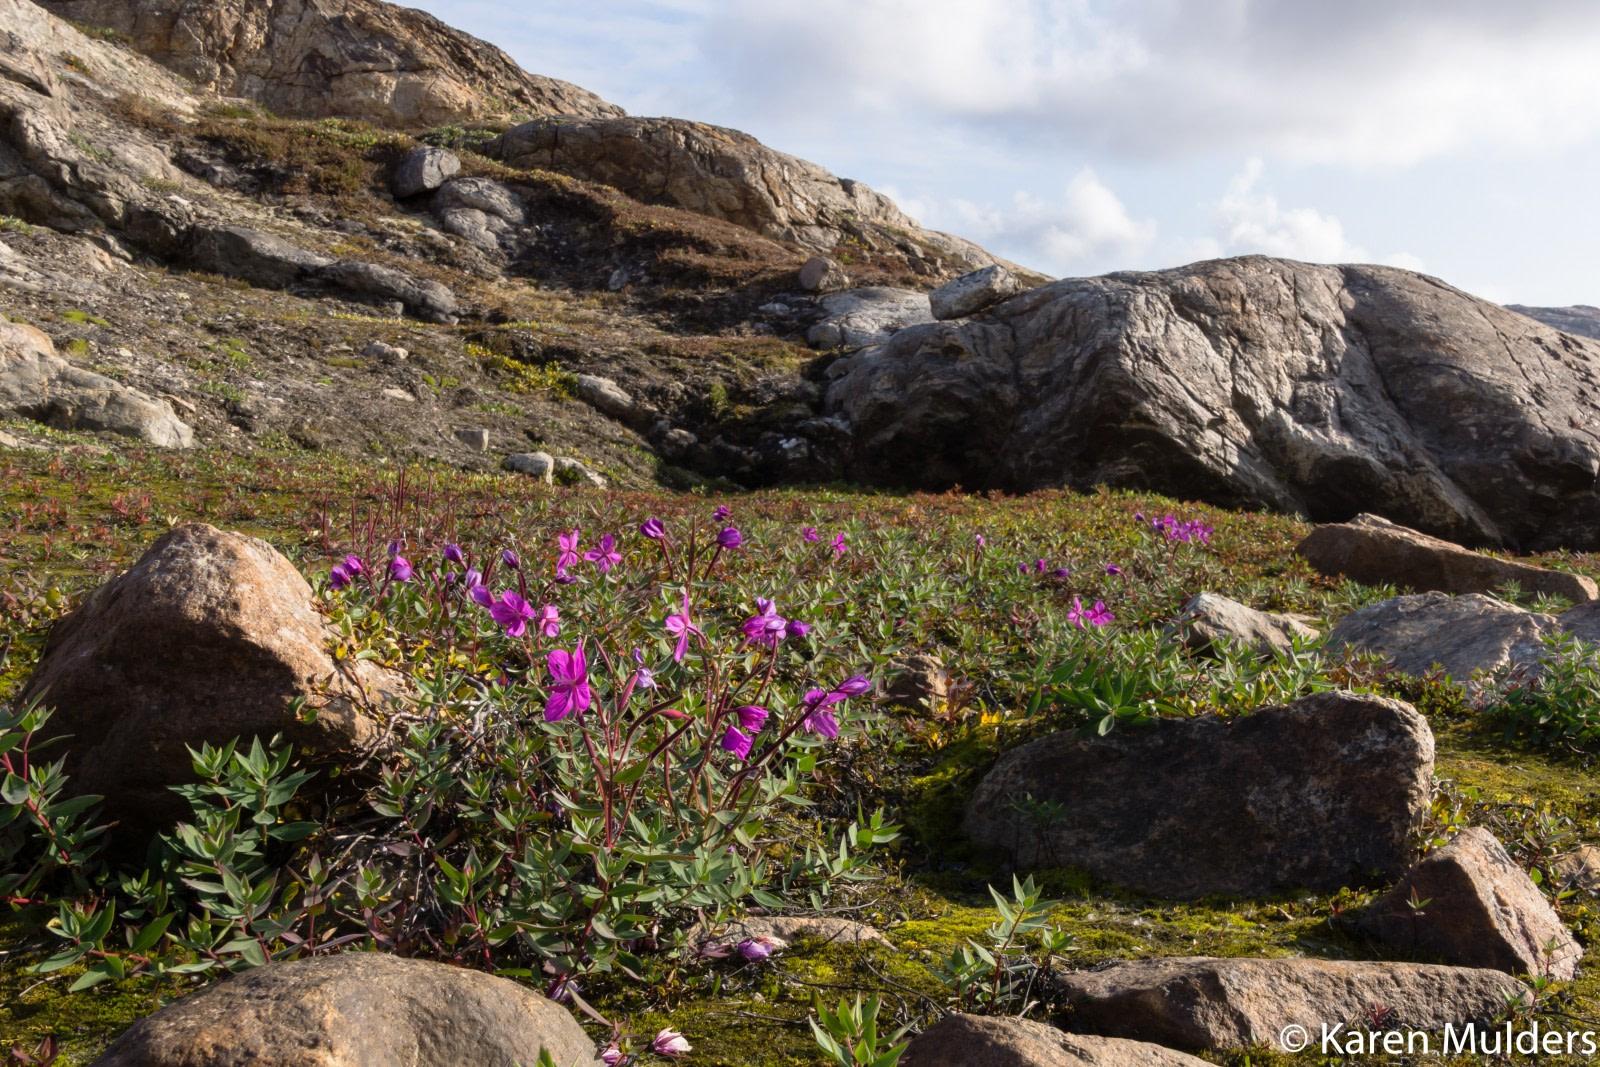 ©KM2019 NE Greenland Scoresby Sund Milneland Niviarsiaq flower Niviarsiaq (Chamaenerion latifolium - Dwarf Fireweed).jpg